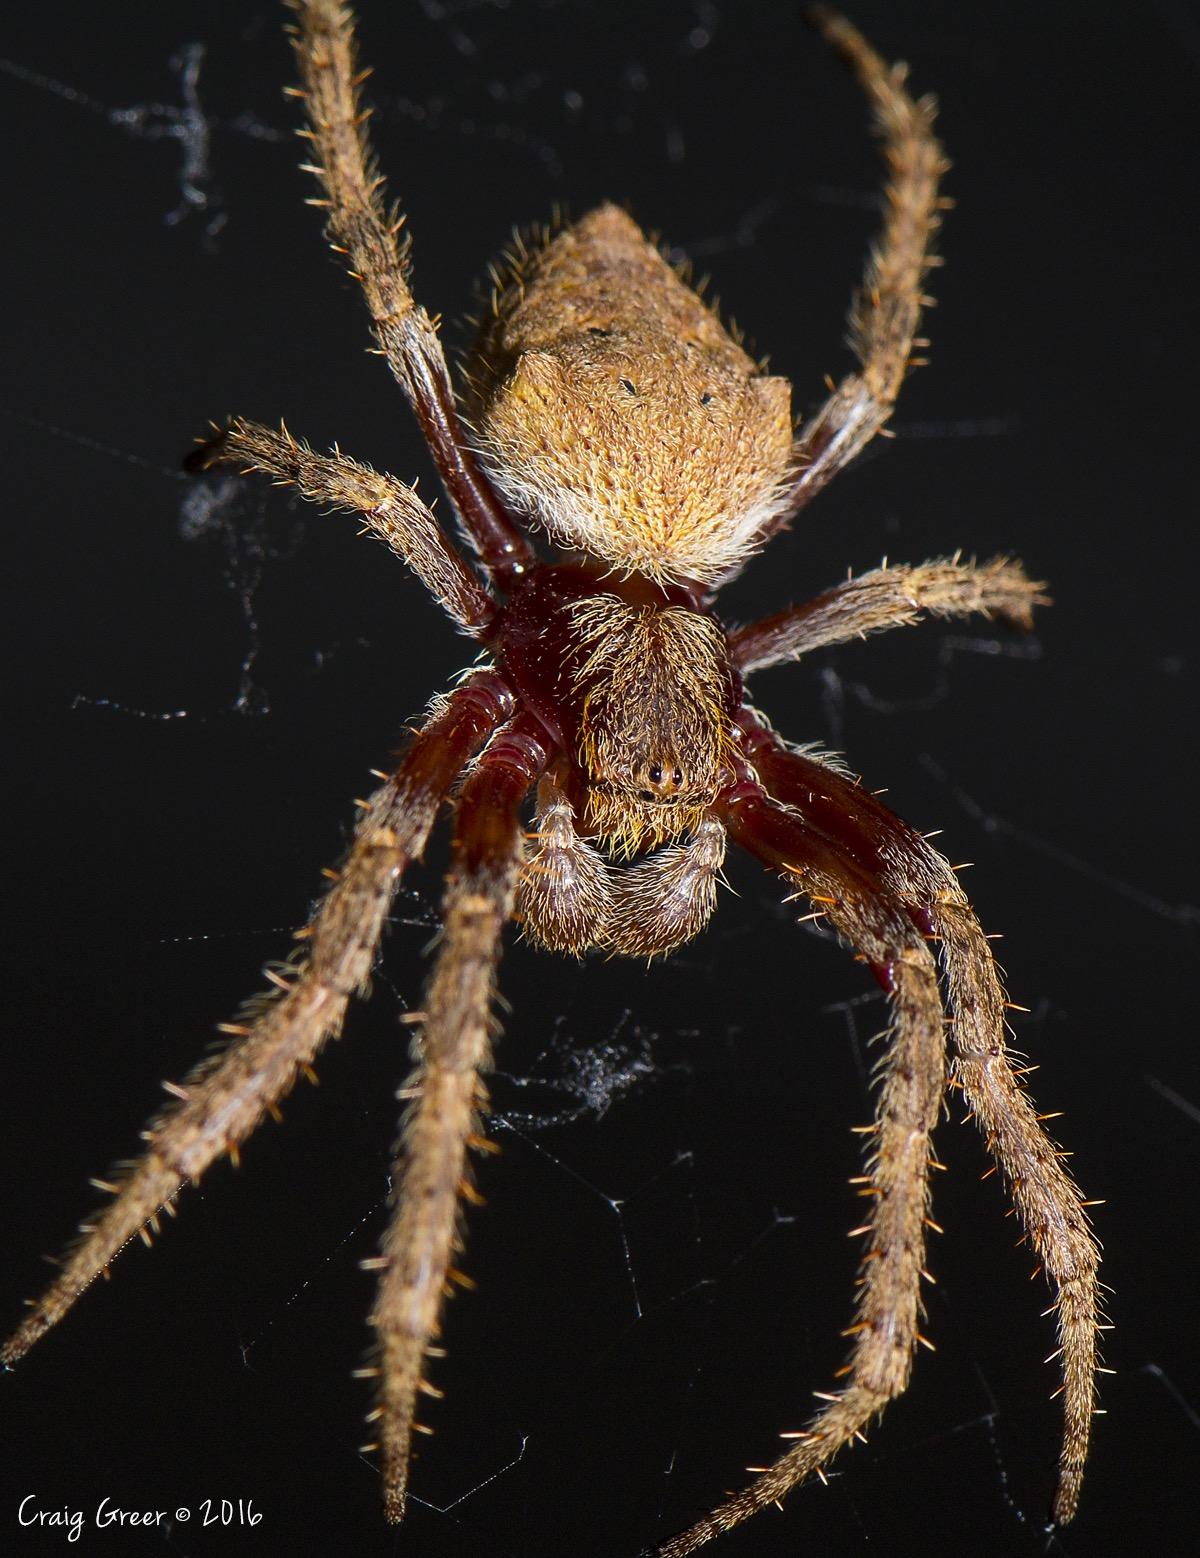 House Spider - Adelaide